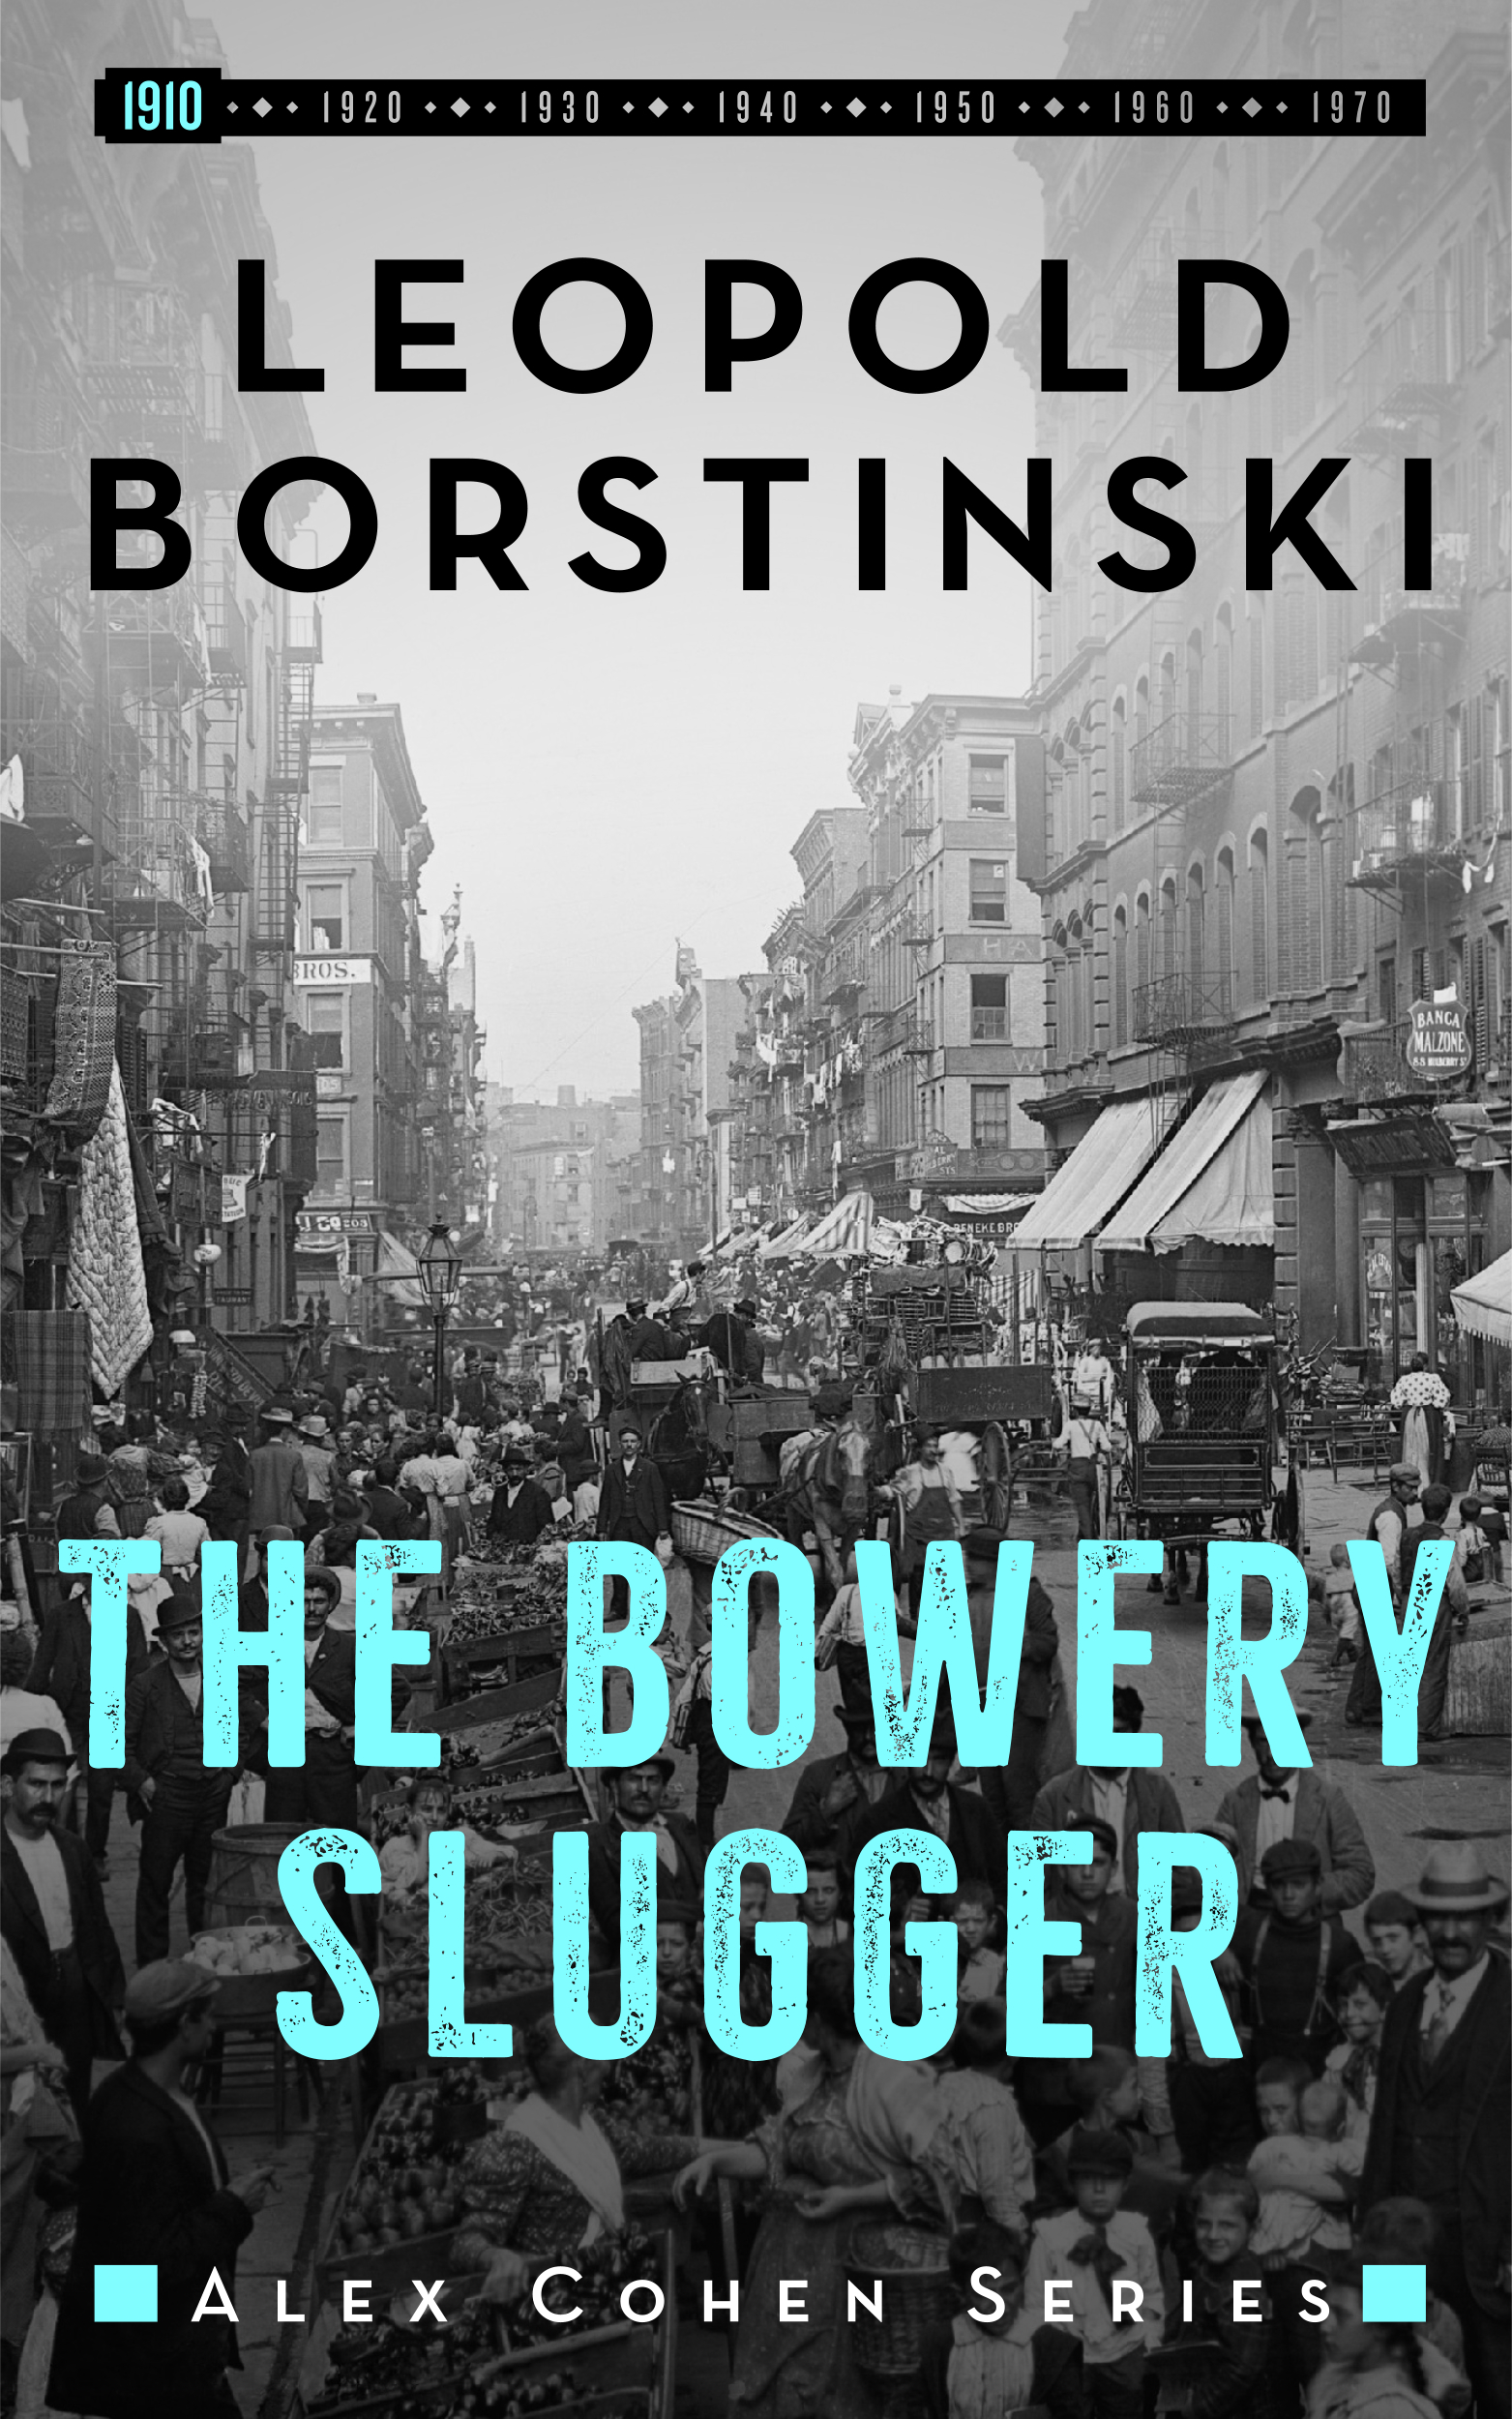 1 Bowery Slugger Hi Res 1910